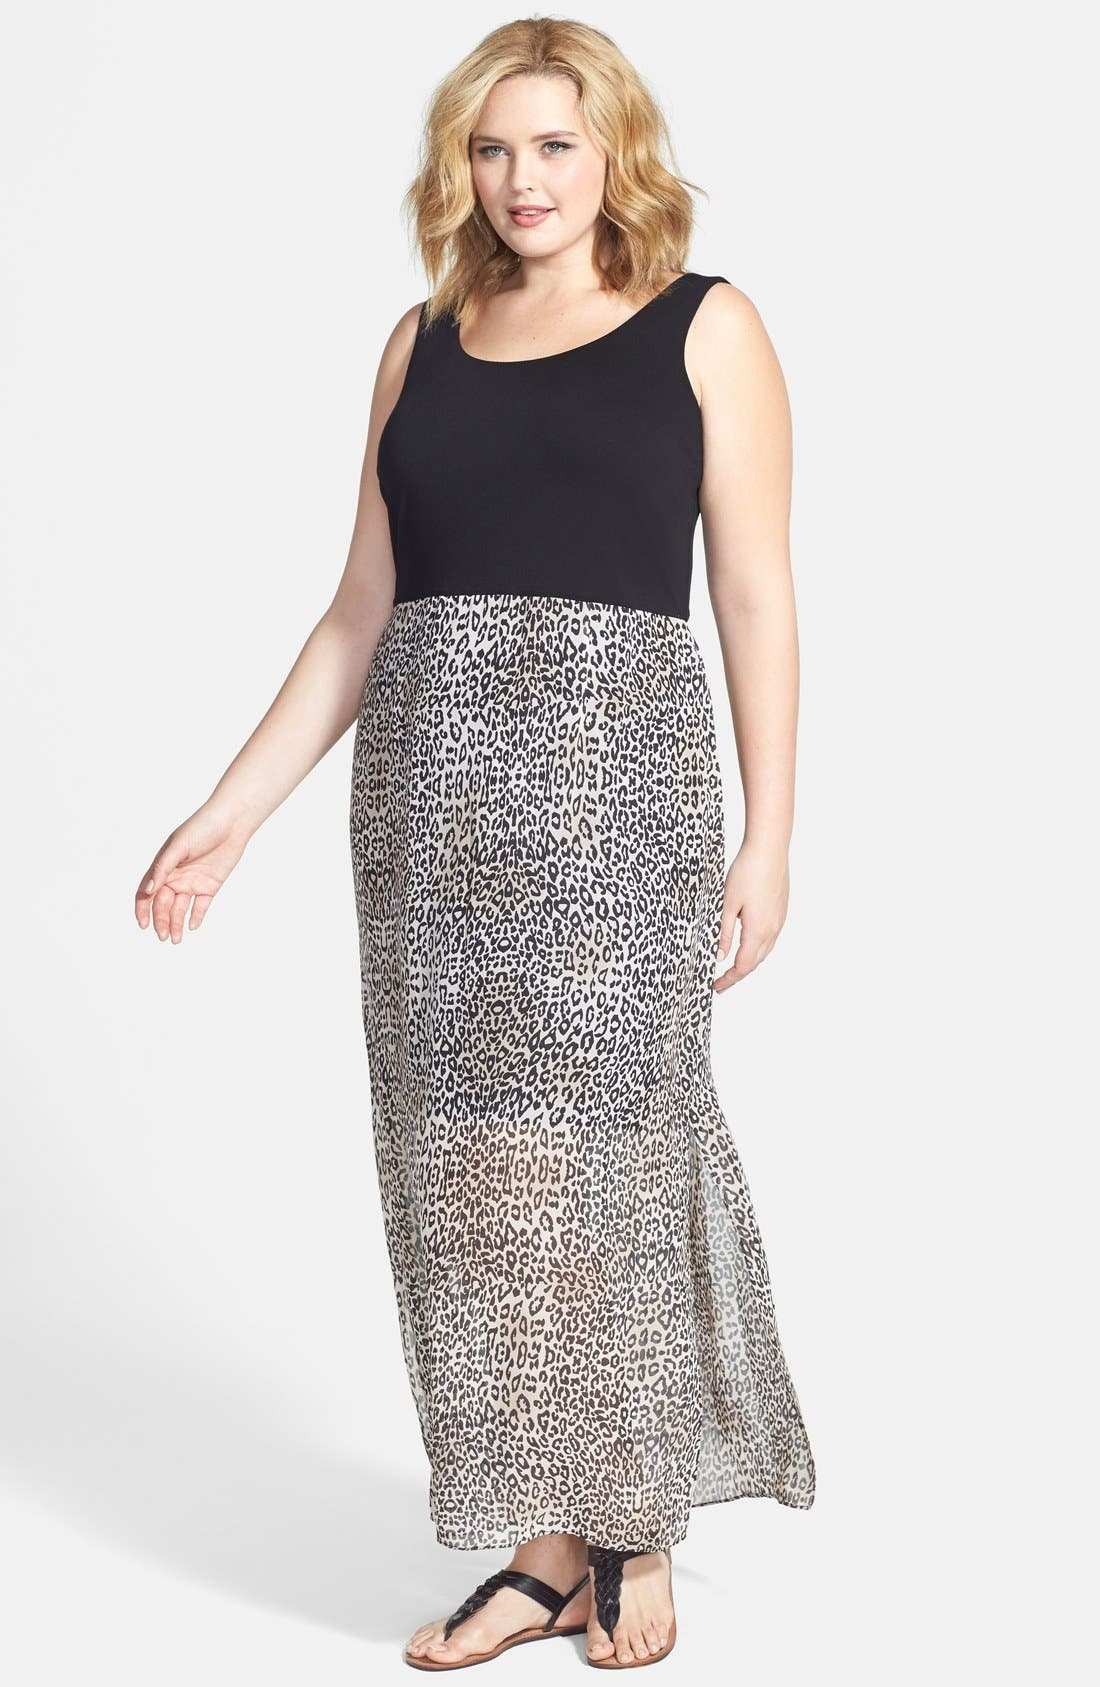 Main Image - Vince Camuto 'Desert Leopard' Chiffon Overlay Maxi Dress (Plus Size)